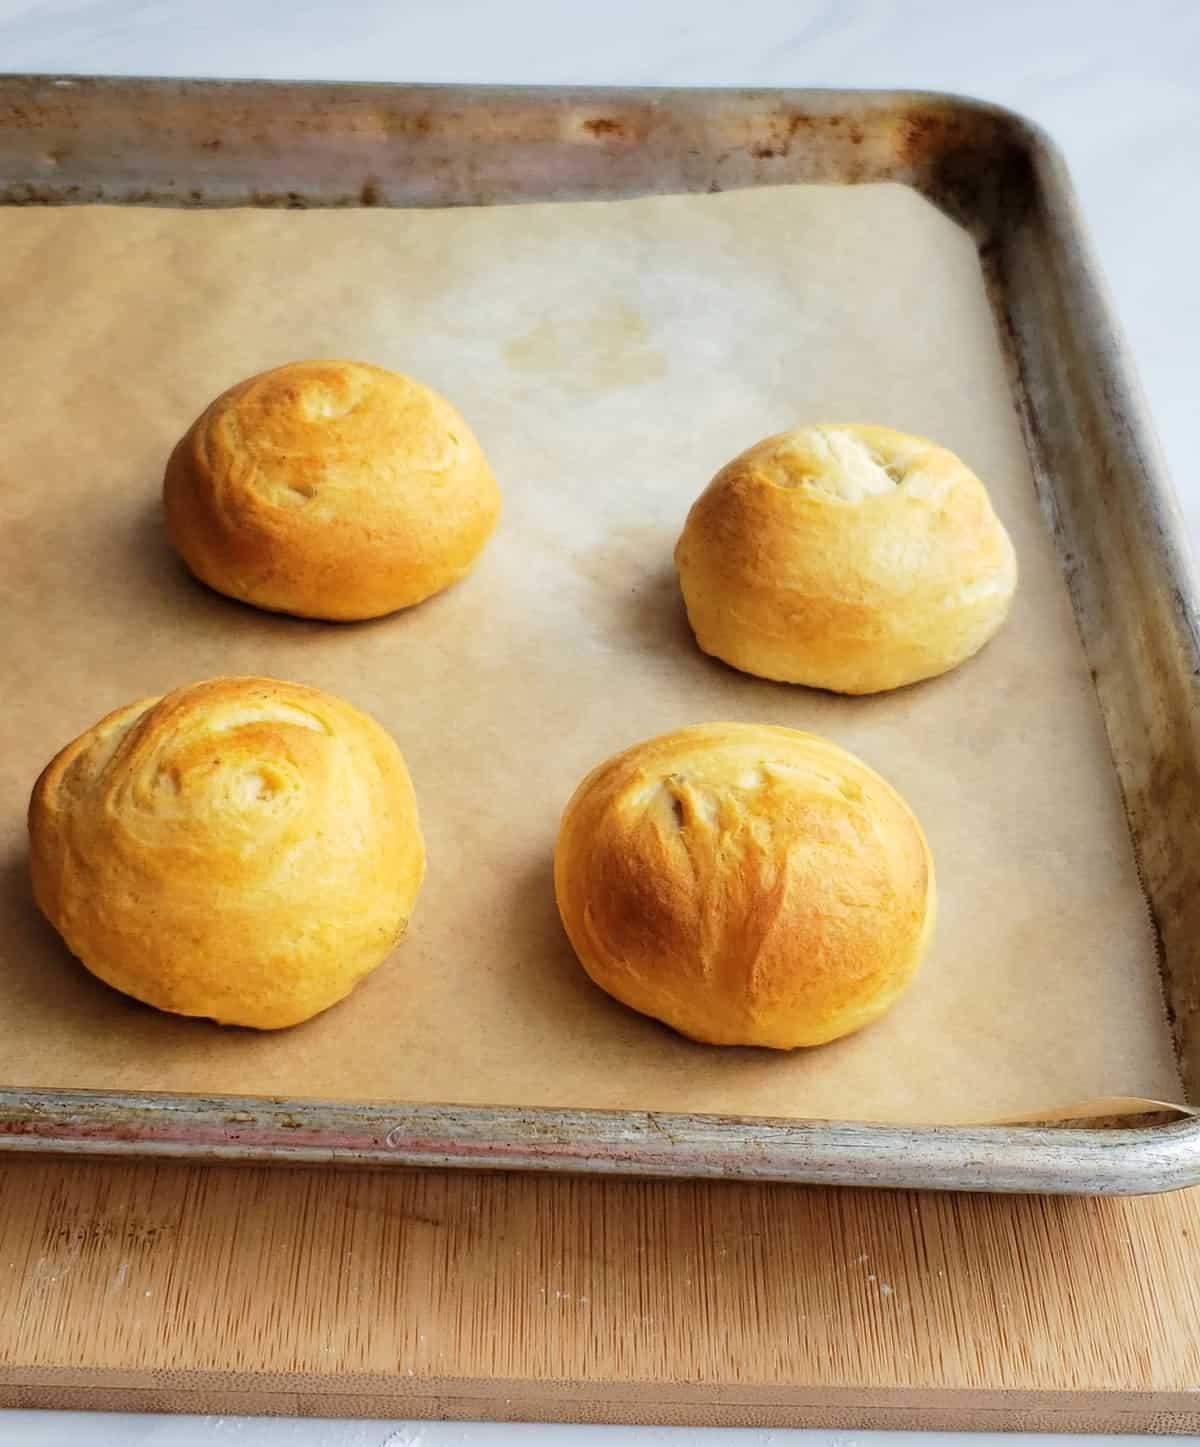 Baked fried Oreos on sheet pan